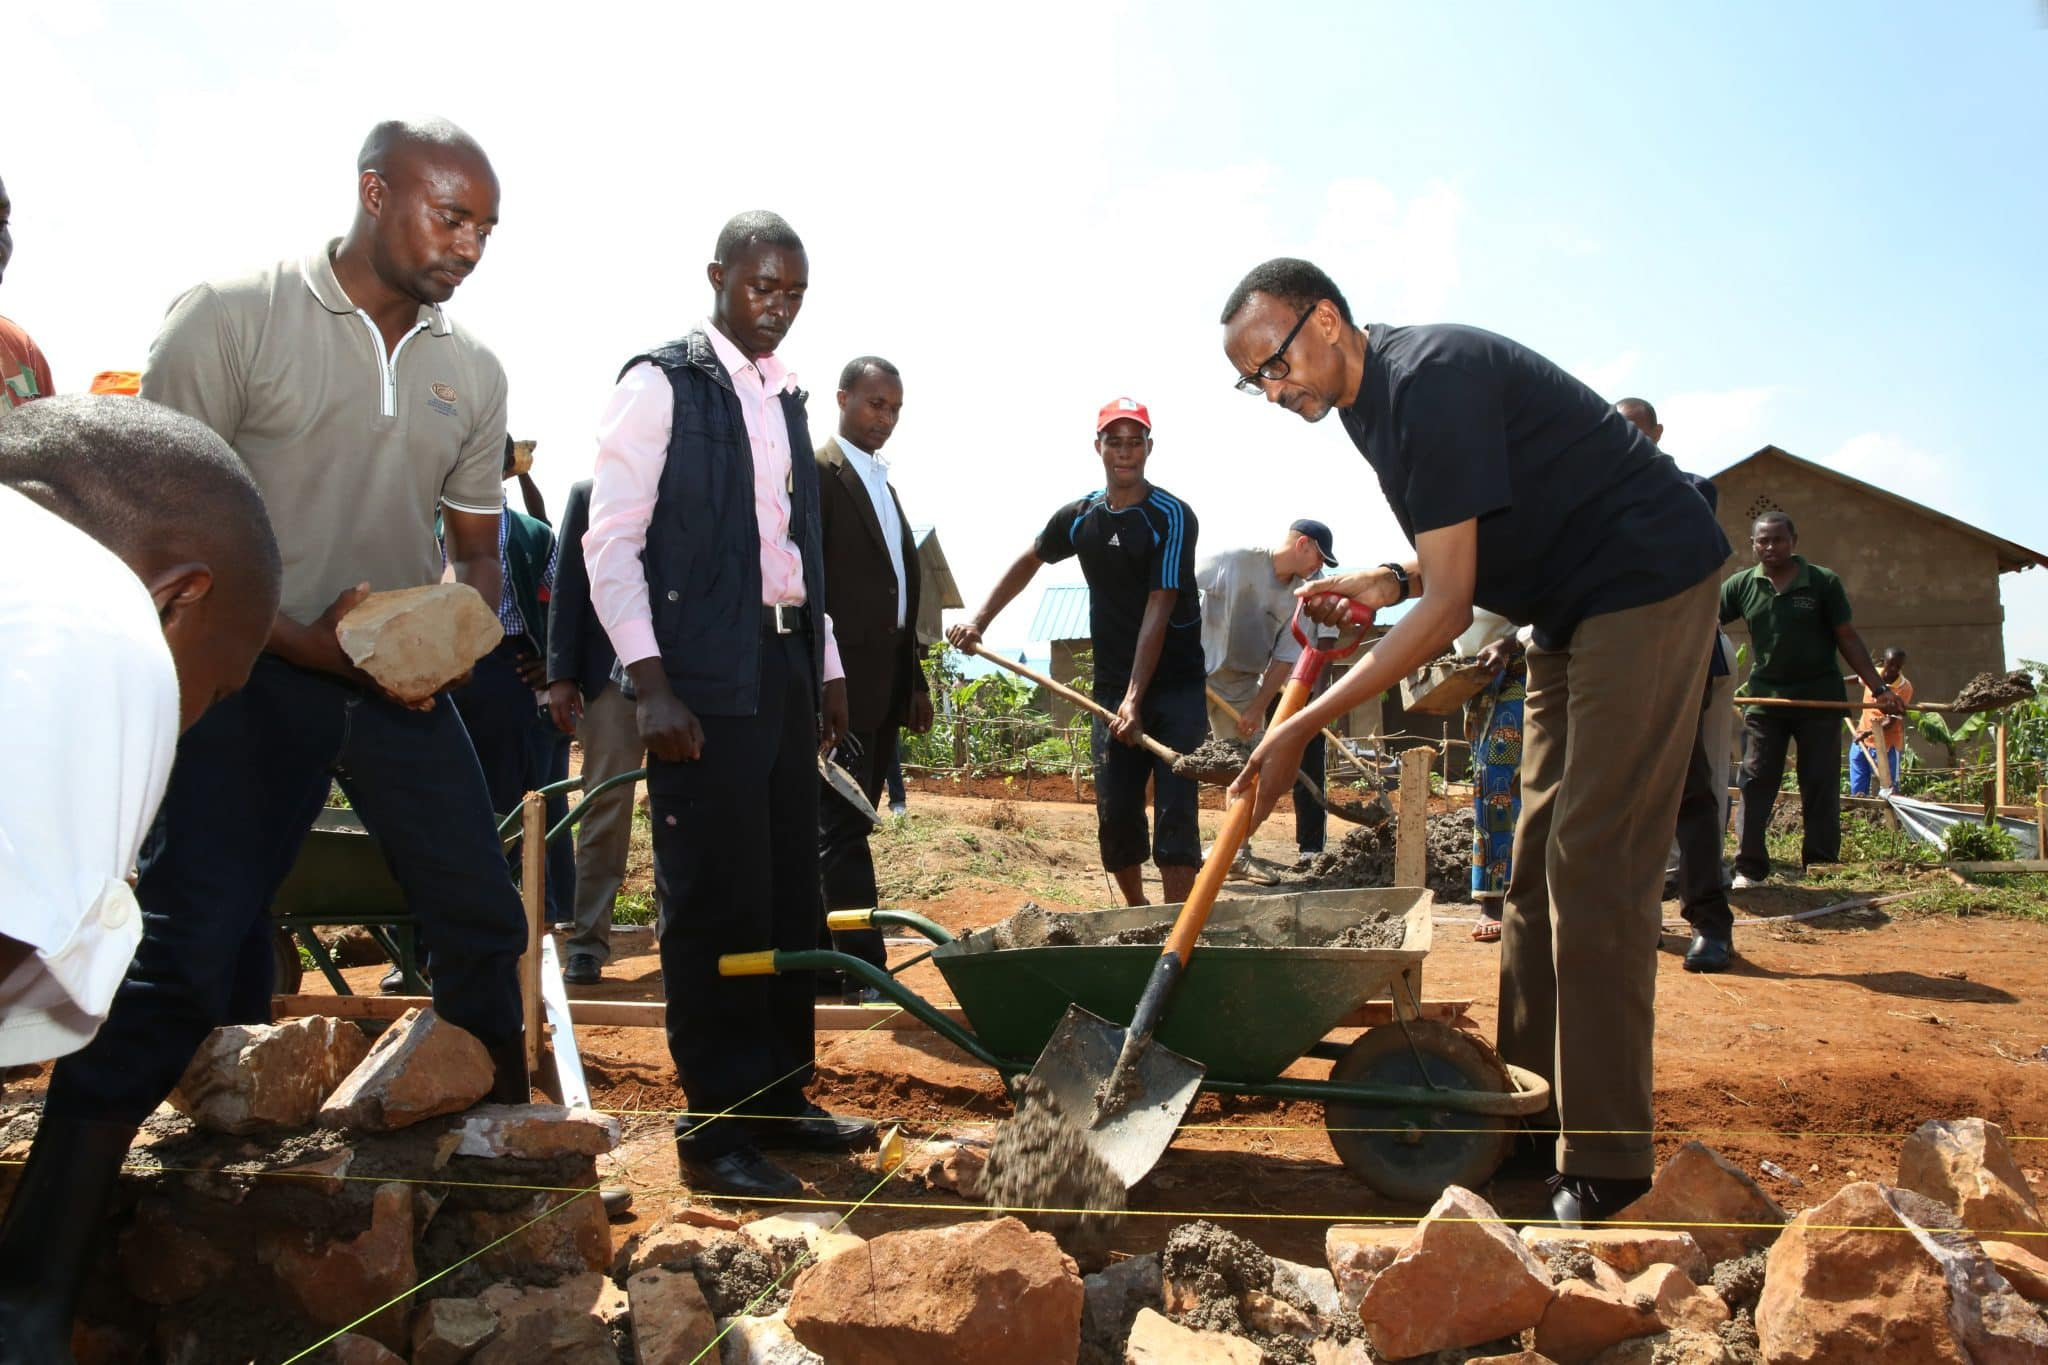 Umuganda community projects. Photo from https://www.flickr.com/photos/paulkagame/12695523803